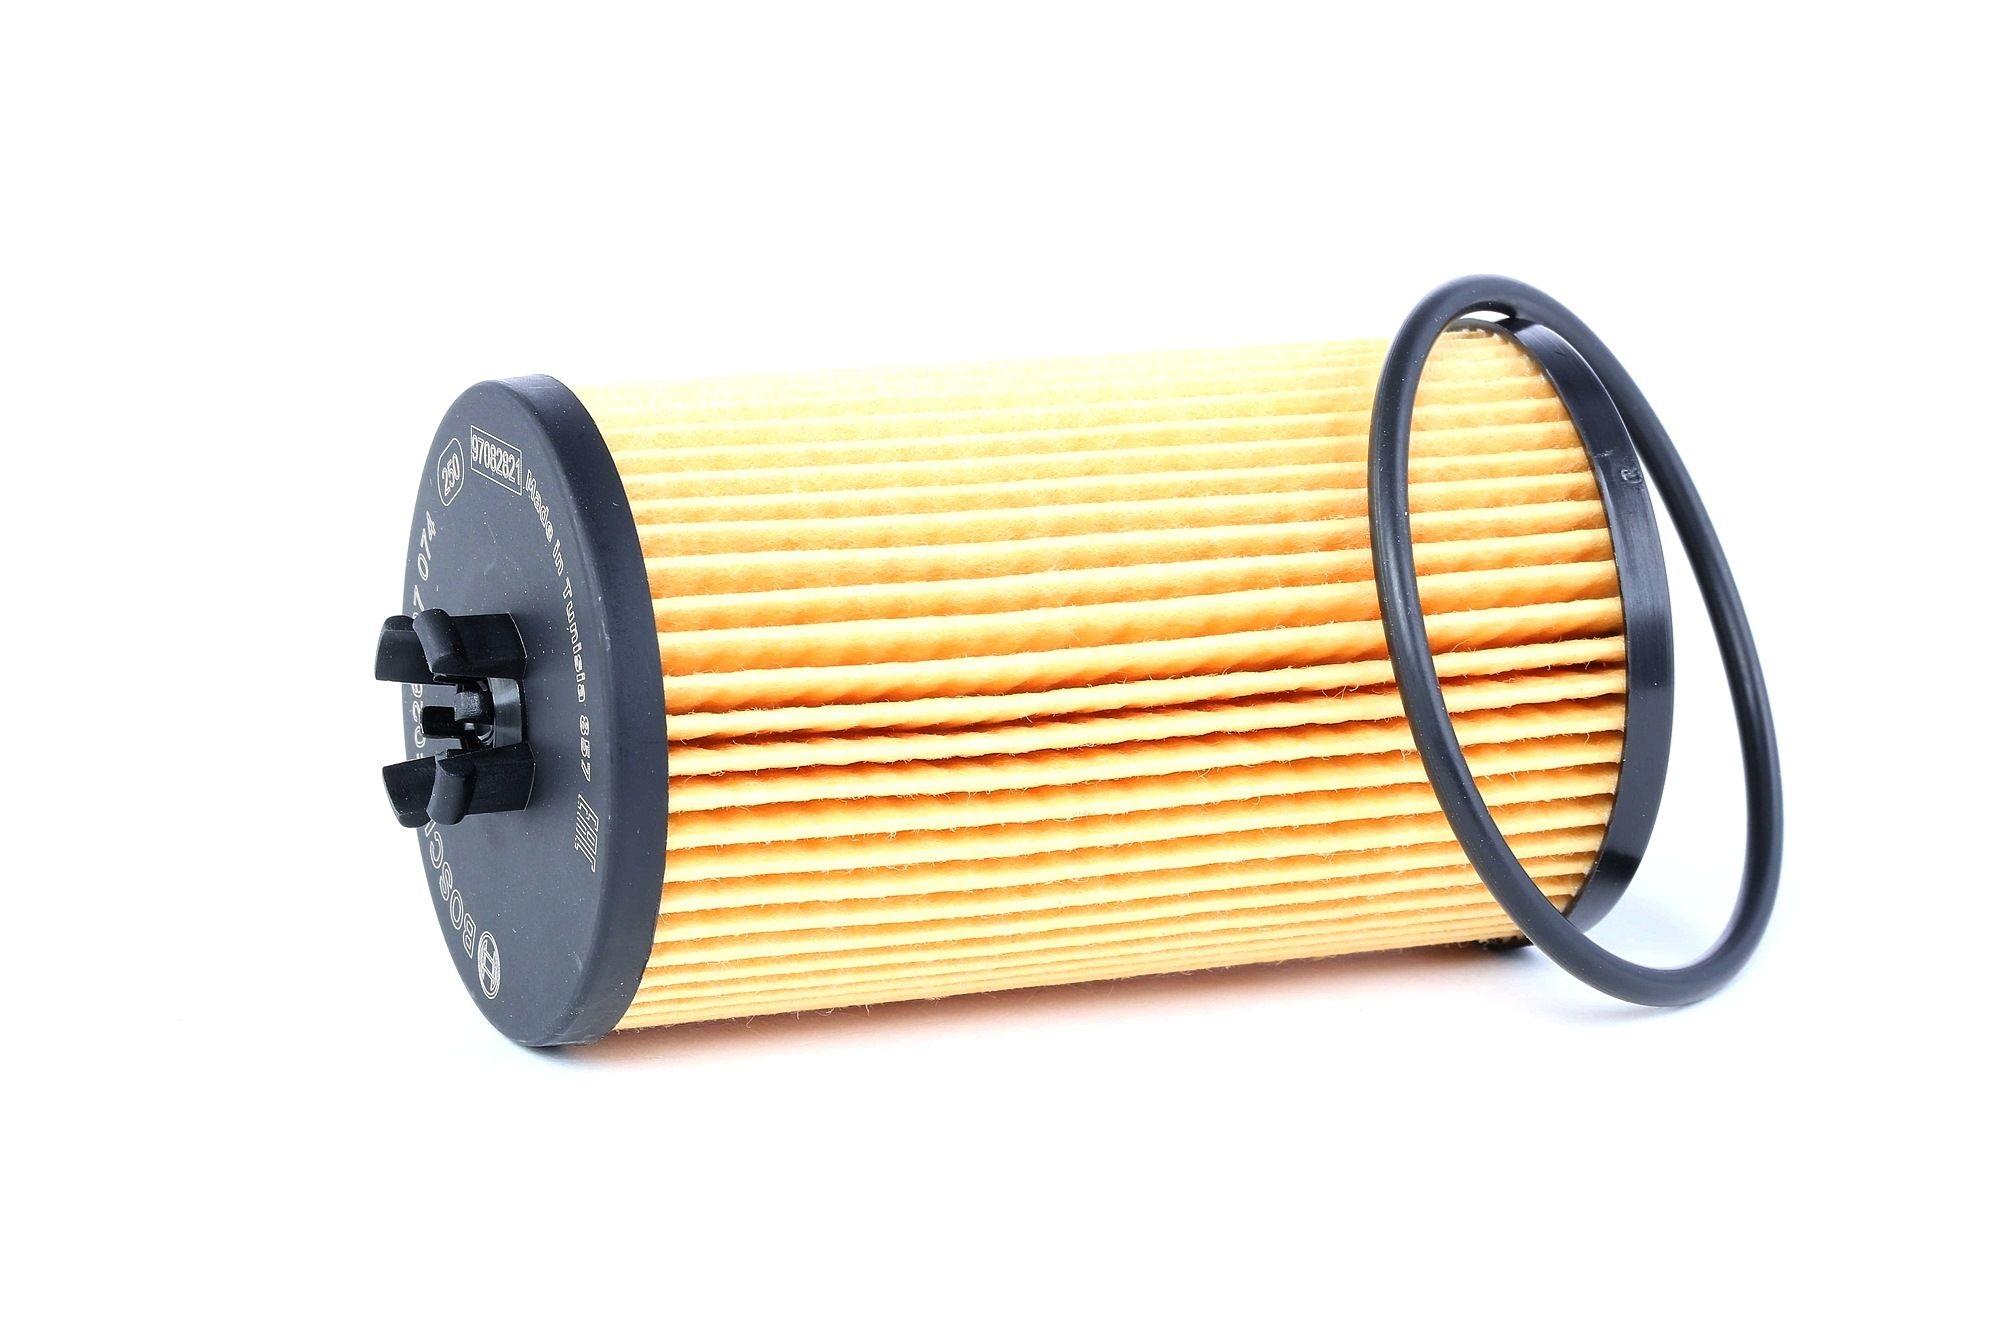 P7074 BOSCH Filtereinsatz, Anschraubfilter Ø: 57mm, Höhe: 107mm Ölfilter F 026 407 074 günstig kaufen